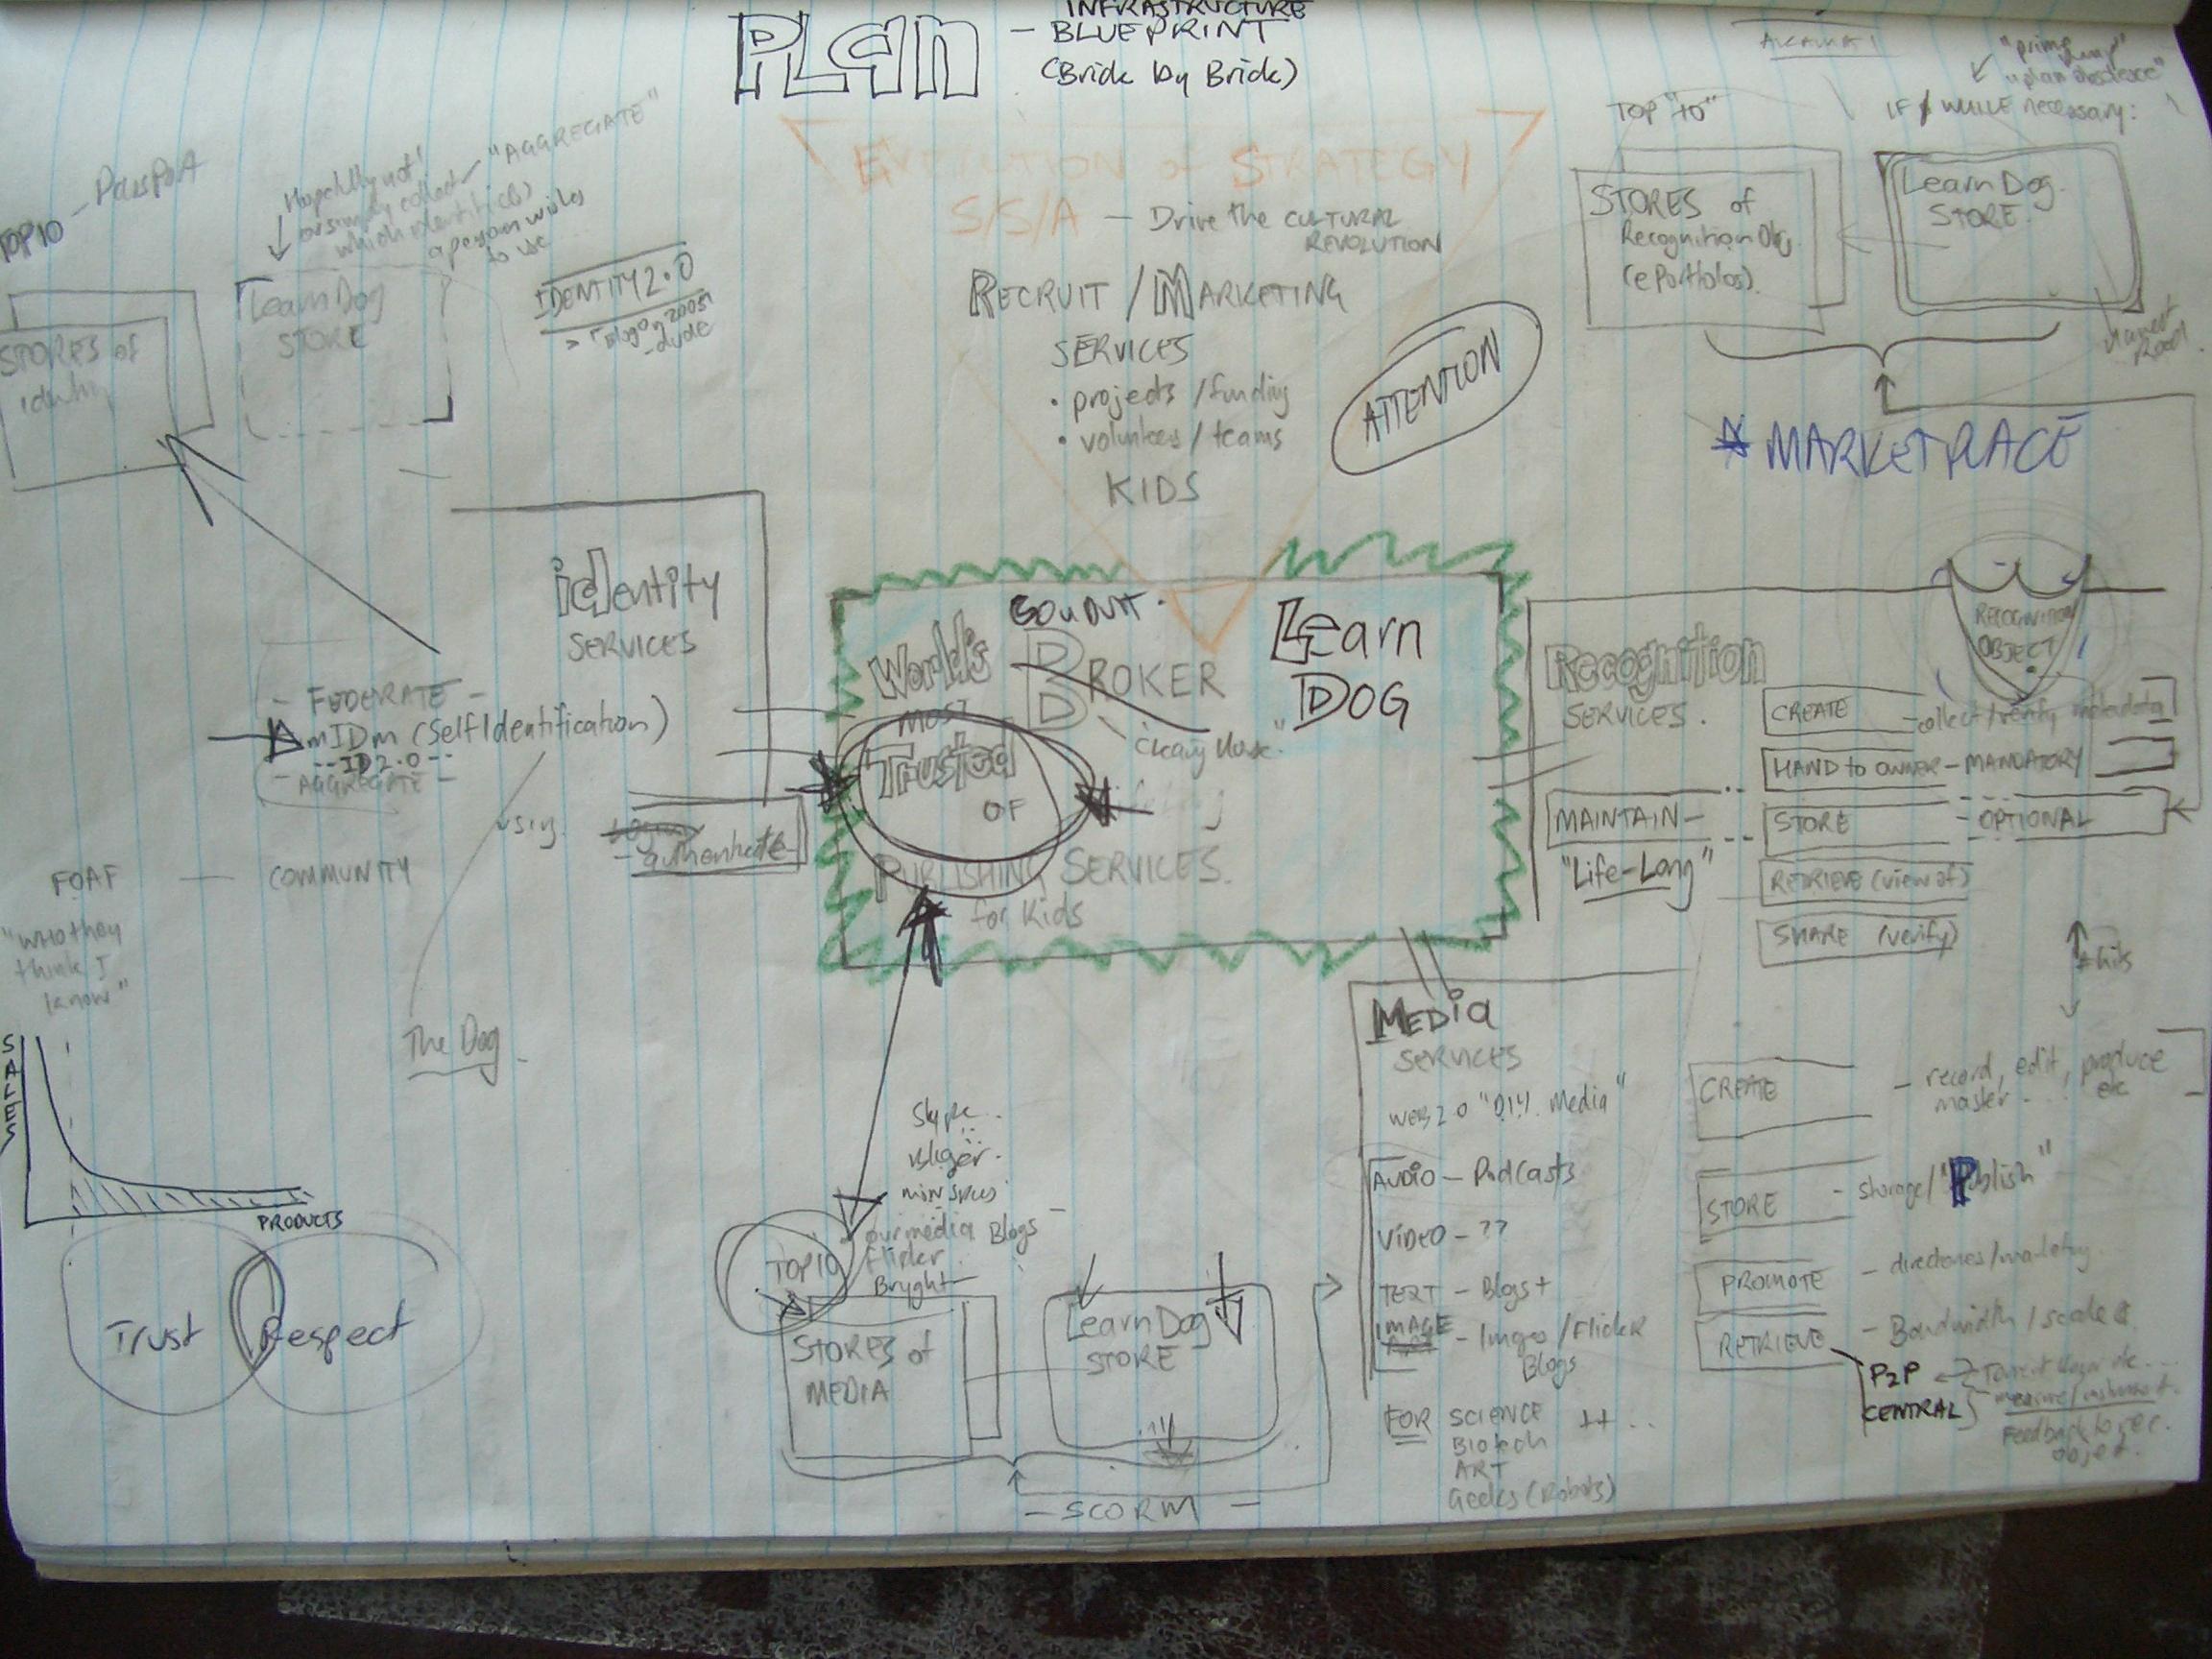 Learndogpup infrastructure blueprint all part of the master plan infrastructure blueprint download learndogarchitectureblueprintg 18516k malvernweather Gallery